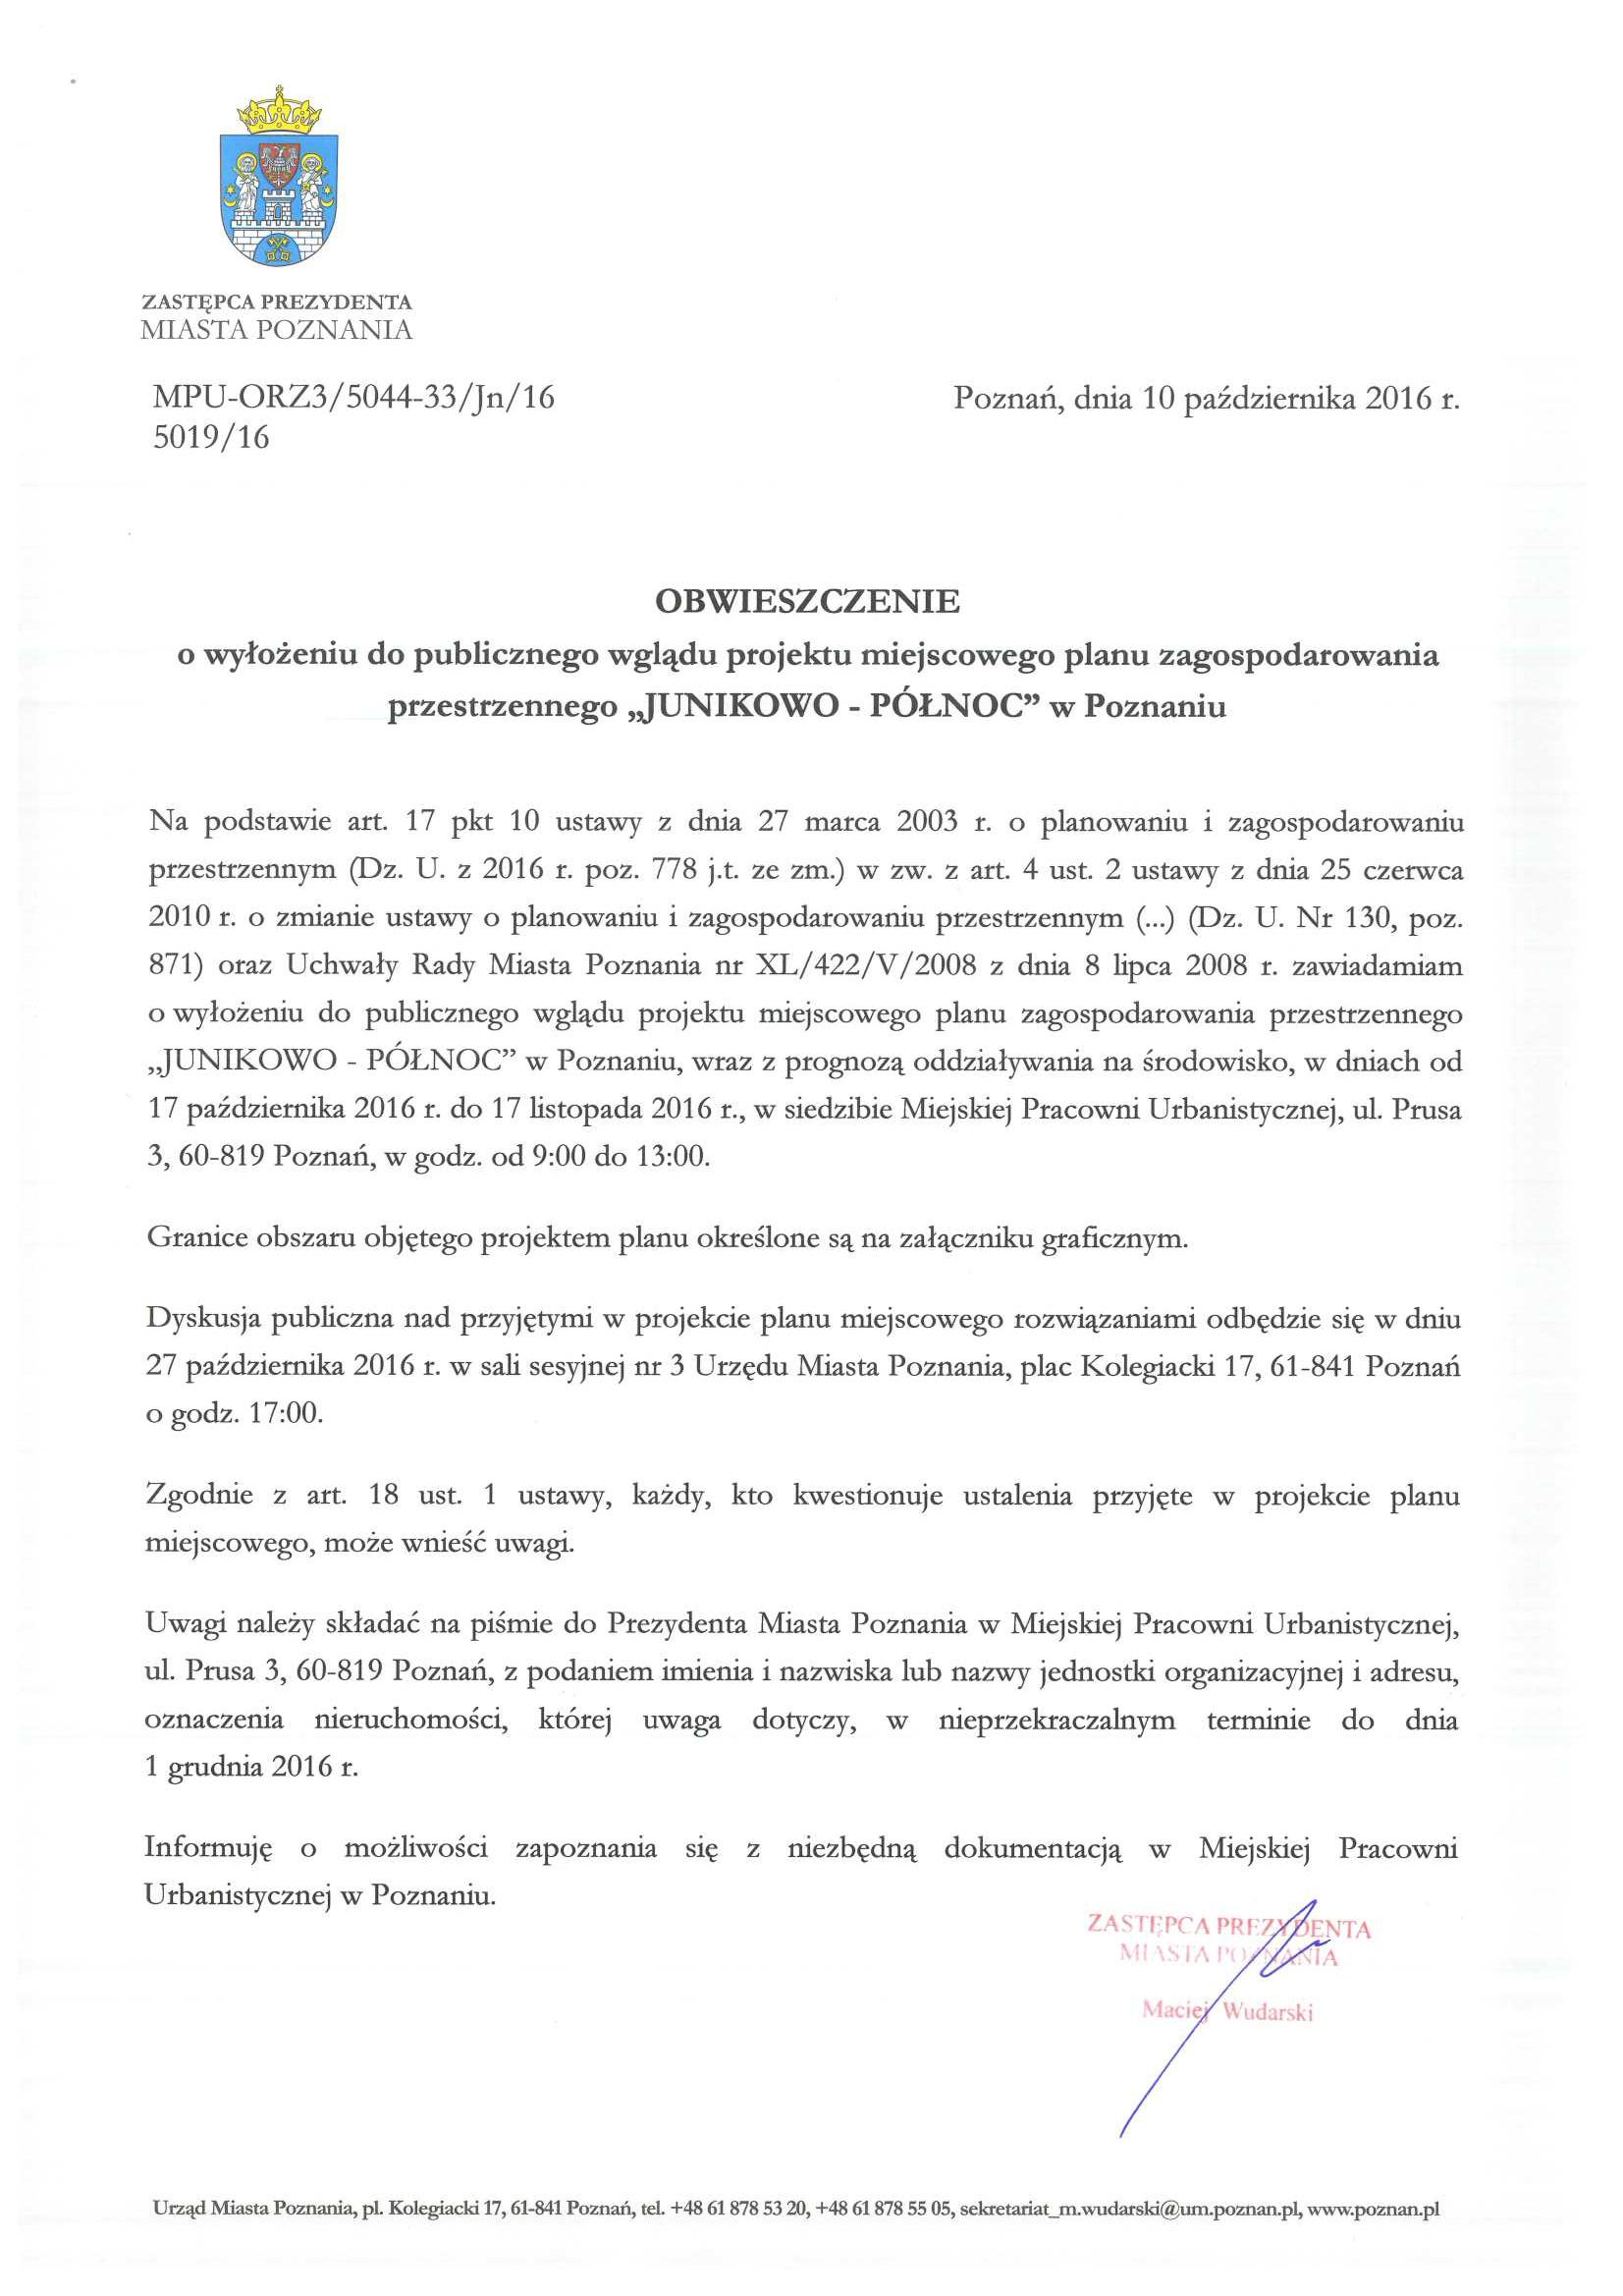 junikowo_polnoc-2